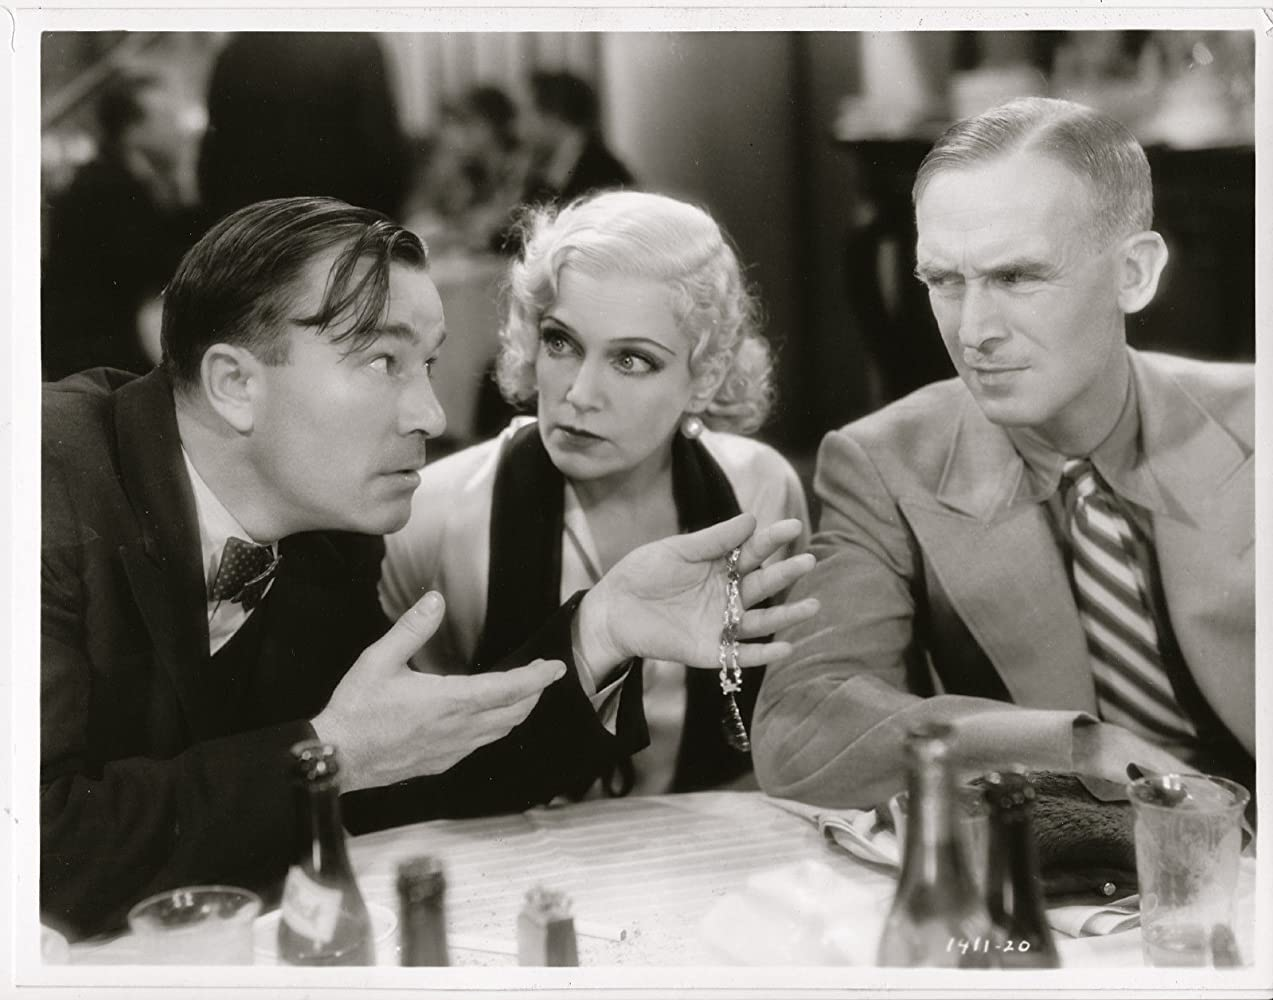 Robert Armstrong, Olga Baclanova, and James Gleason in The Billion Dollar Scandal (1933)